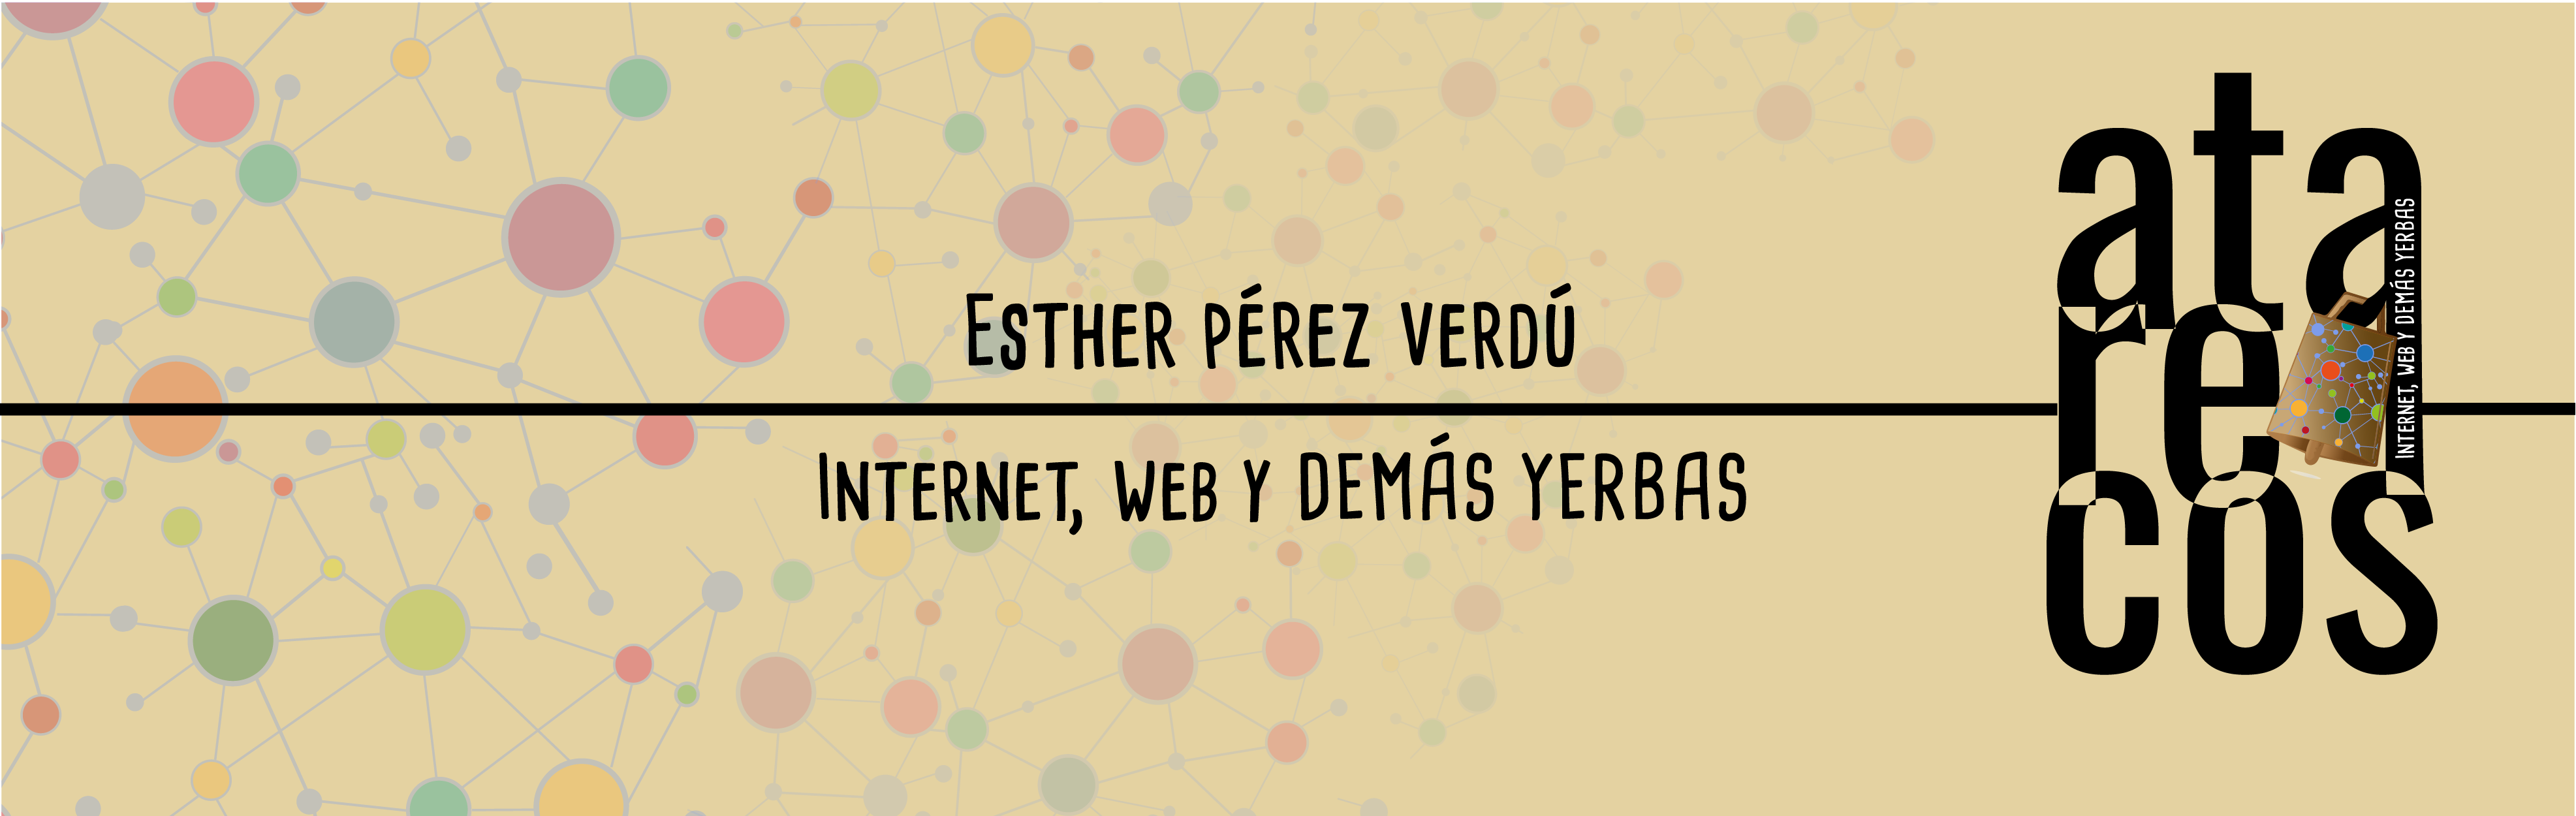 Esther Pérez Verdú - Atarecos